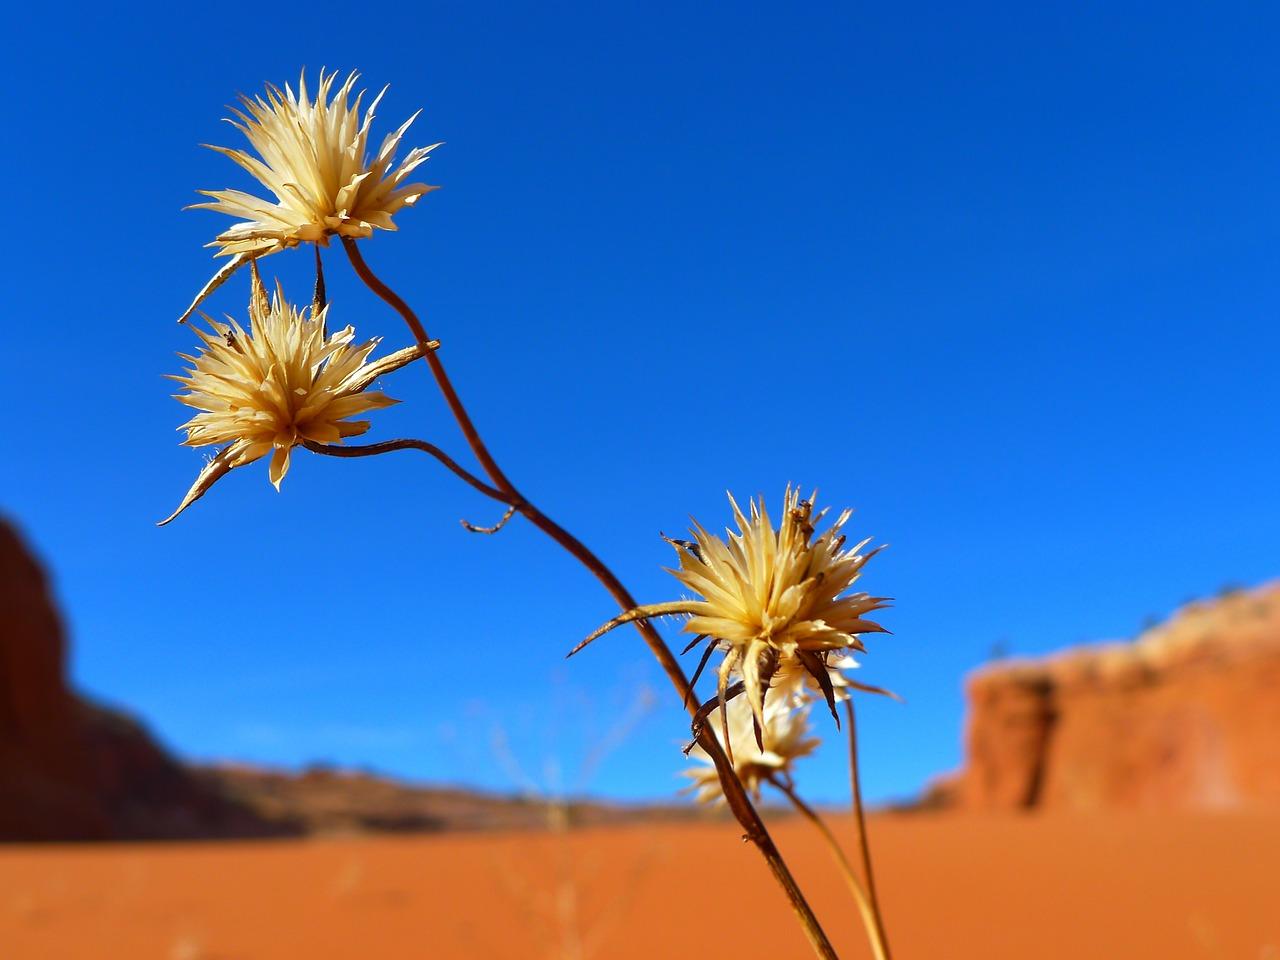 La belleza del desierto